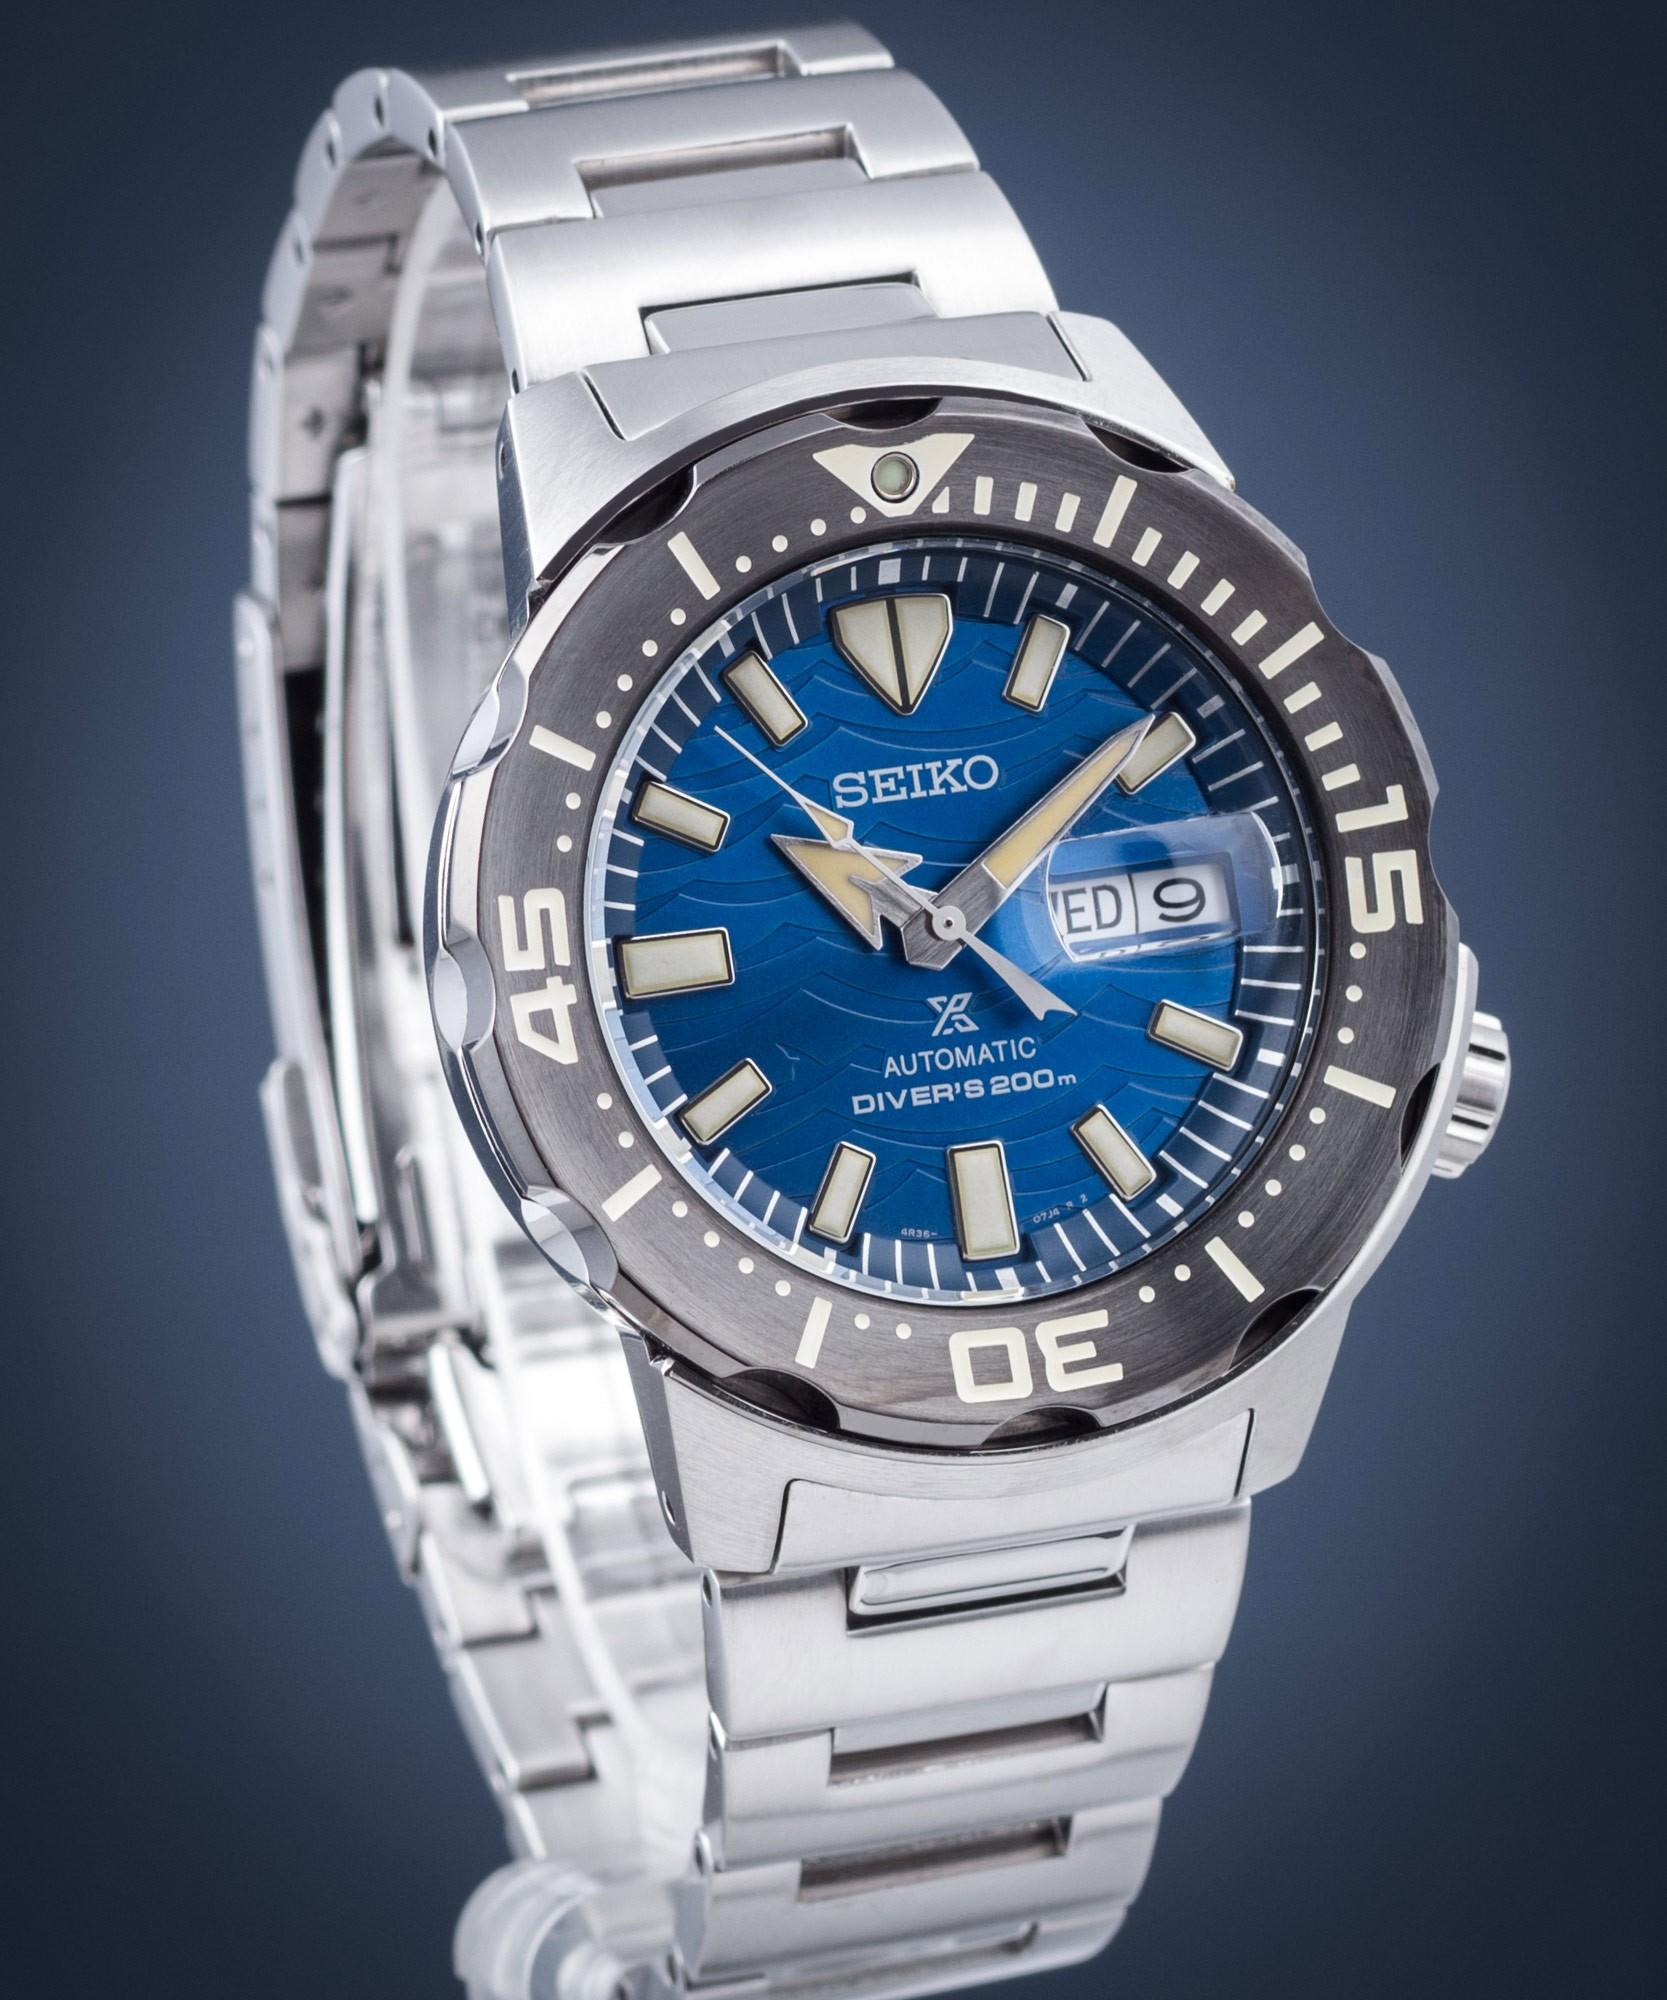 Zegarek męski Seiko Prospex SRPE09K1 za 1578,21zł @ Zegarownia